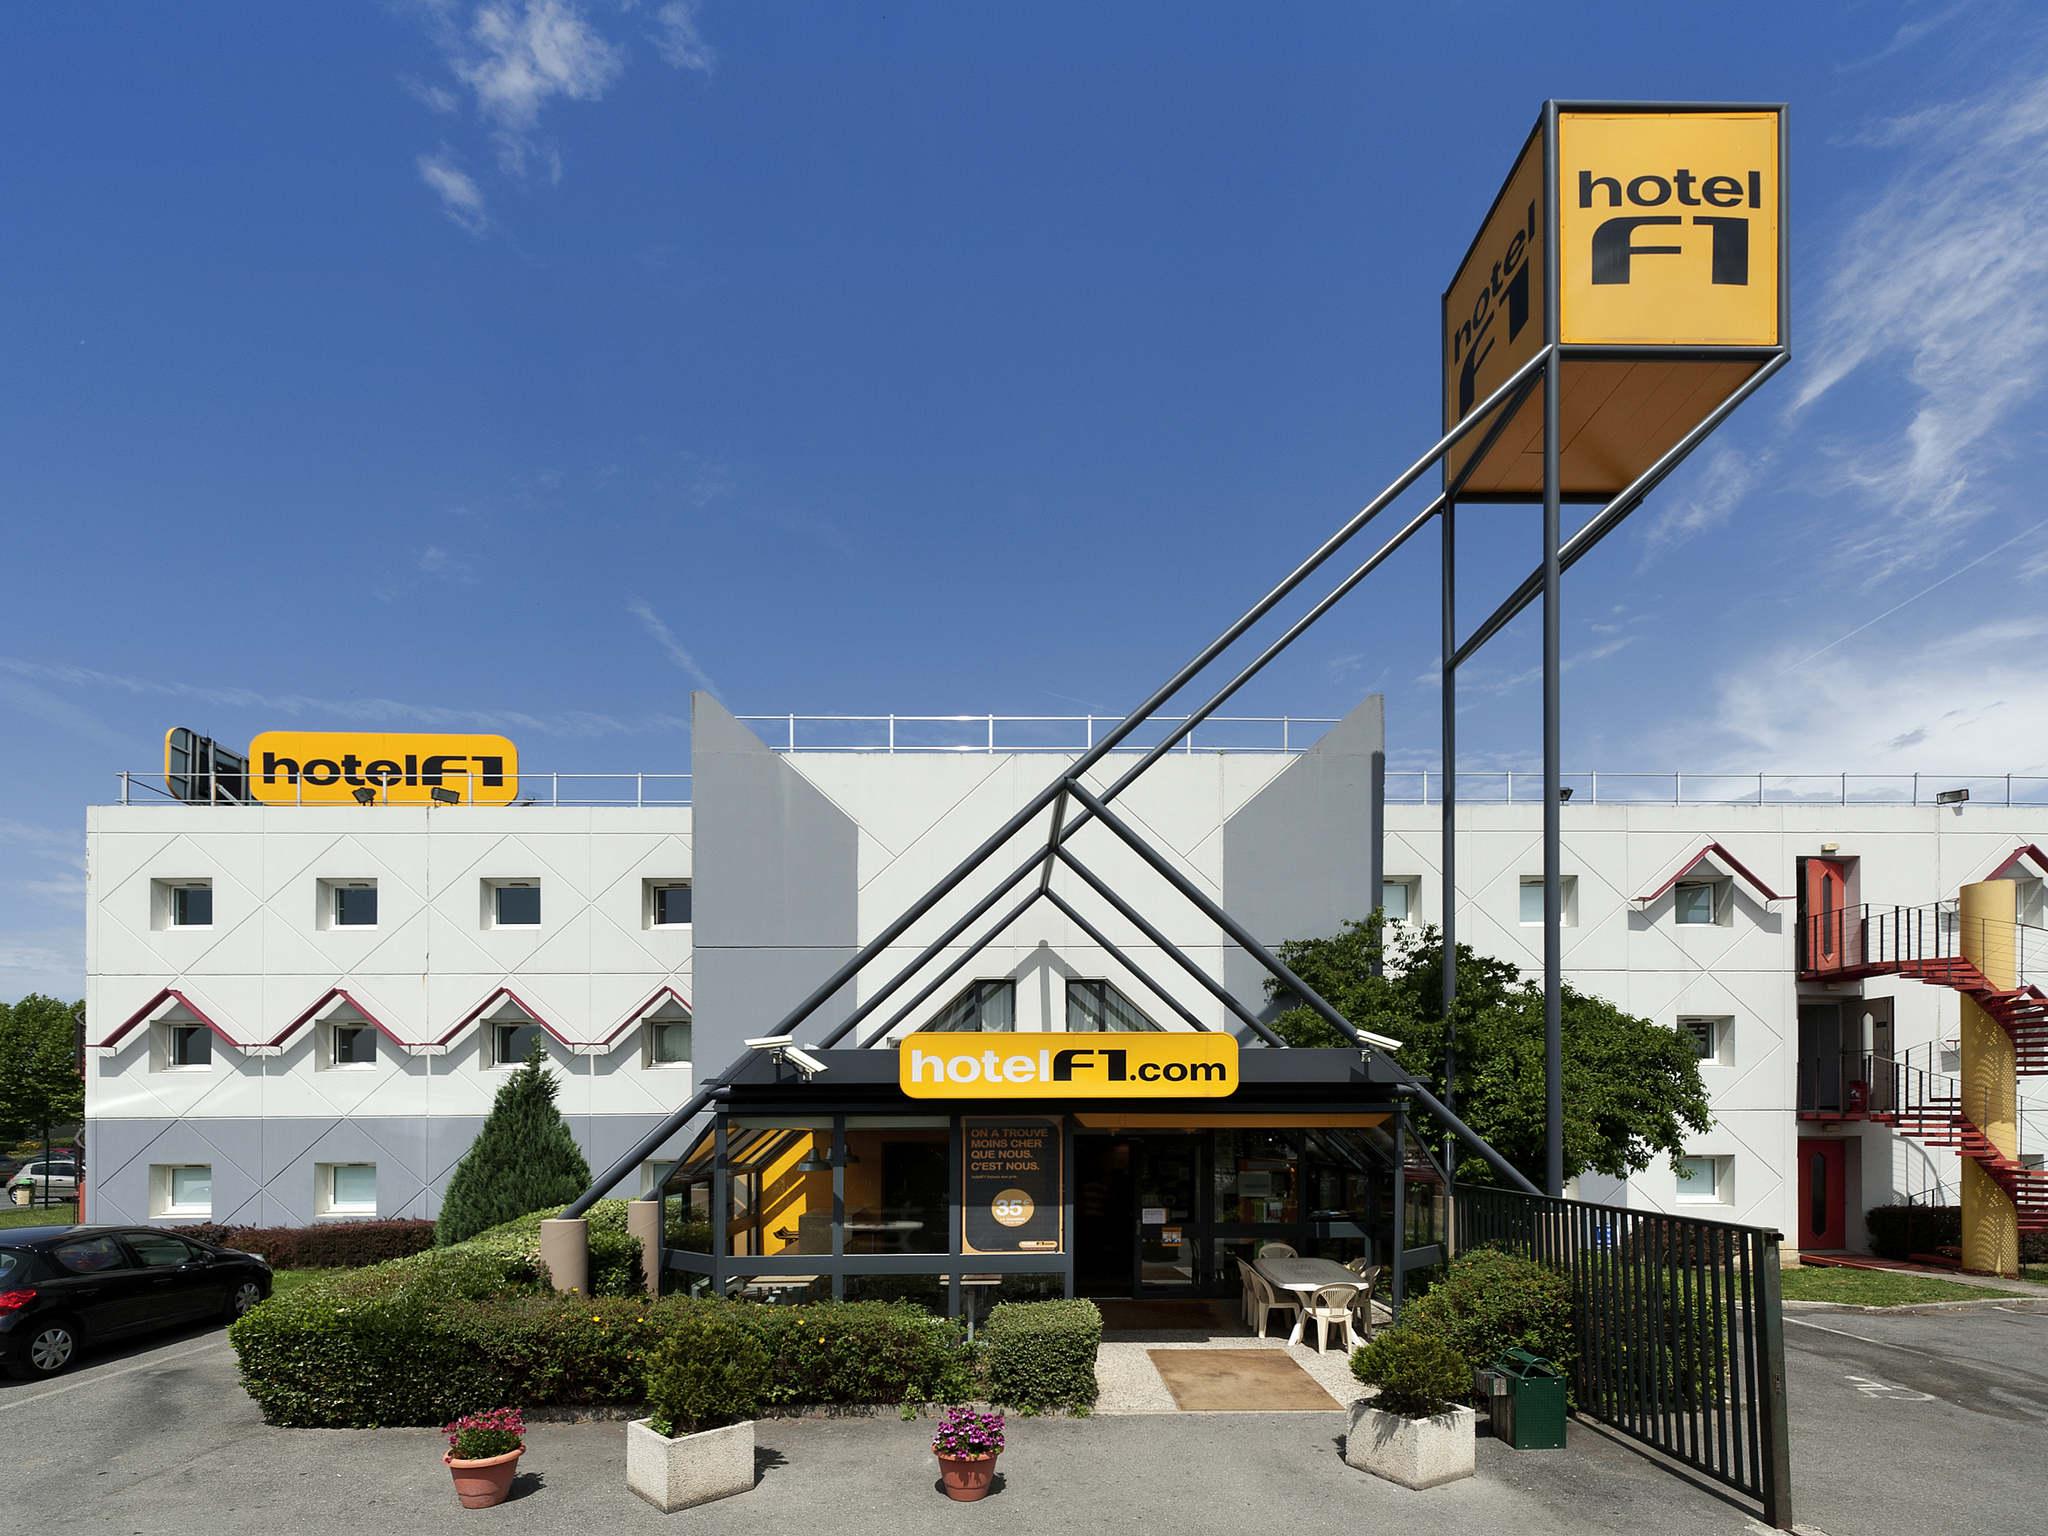 Hotel - hotelF1 Mennecy